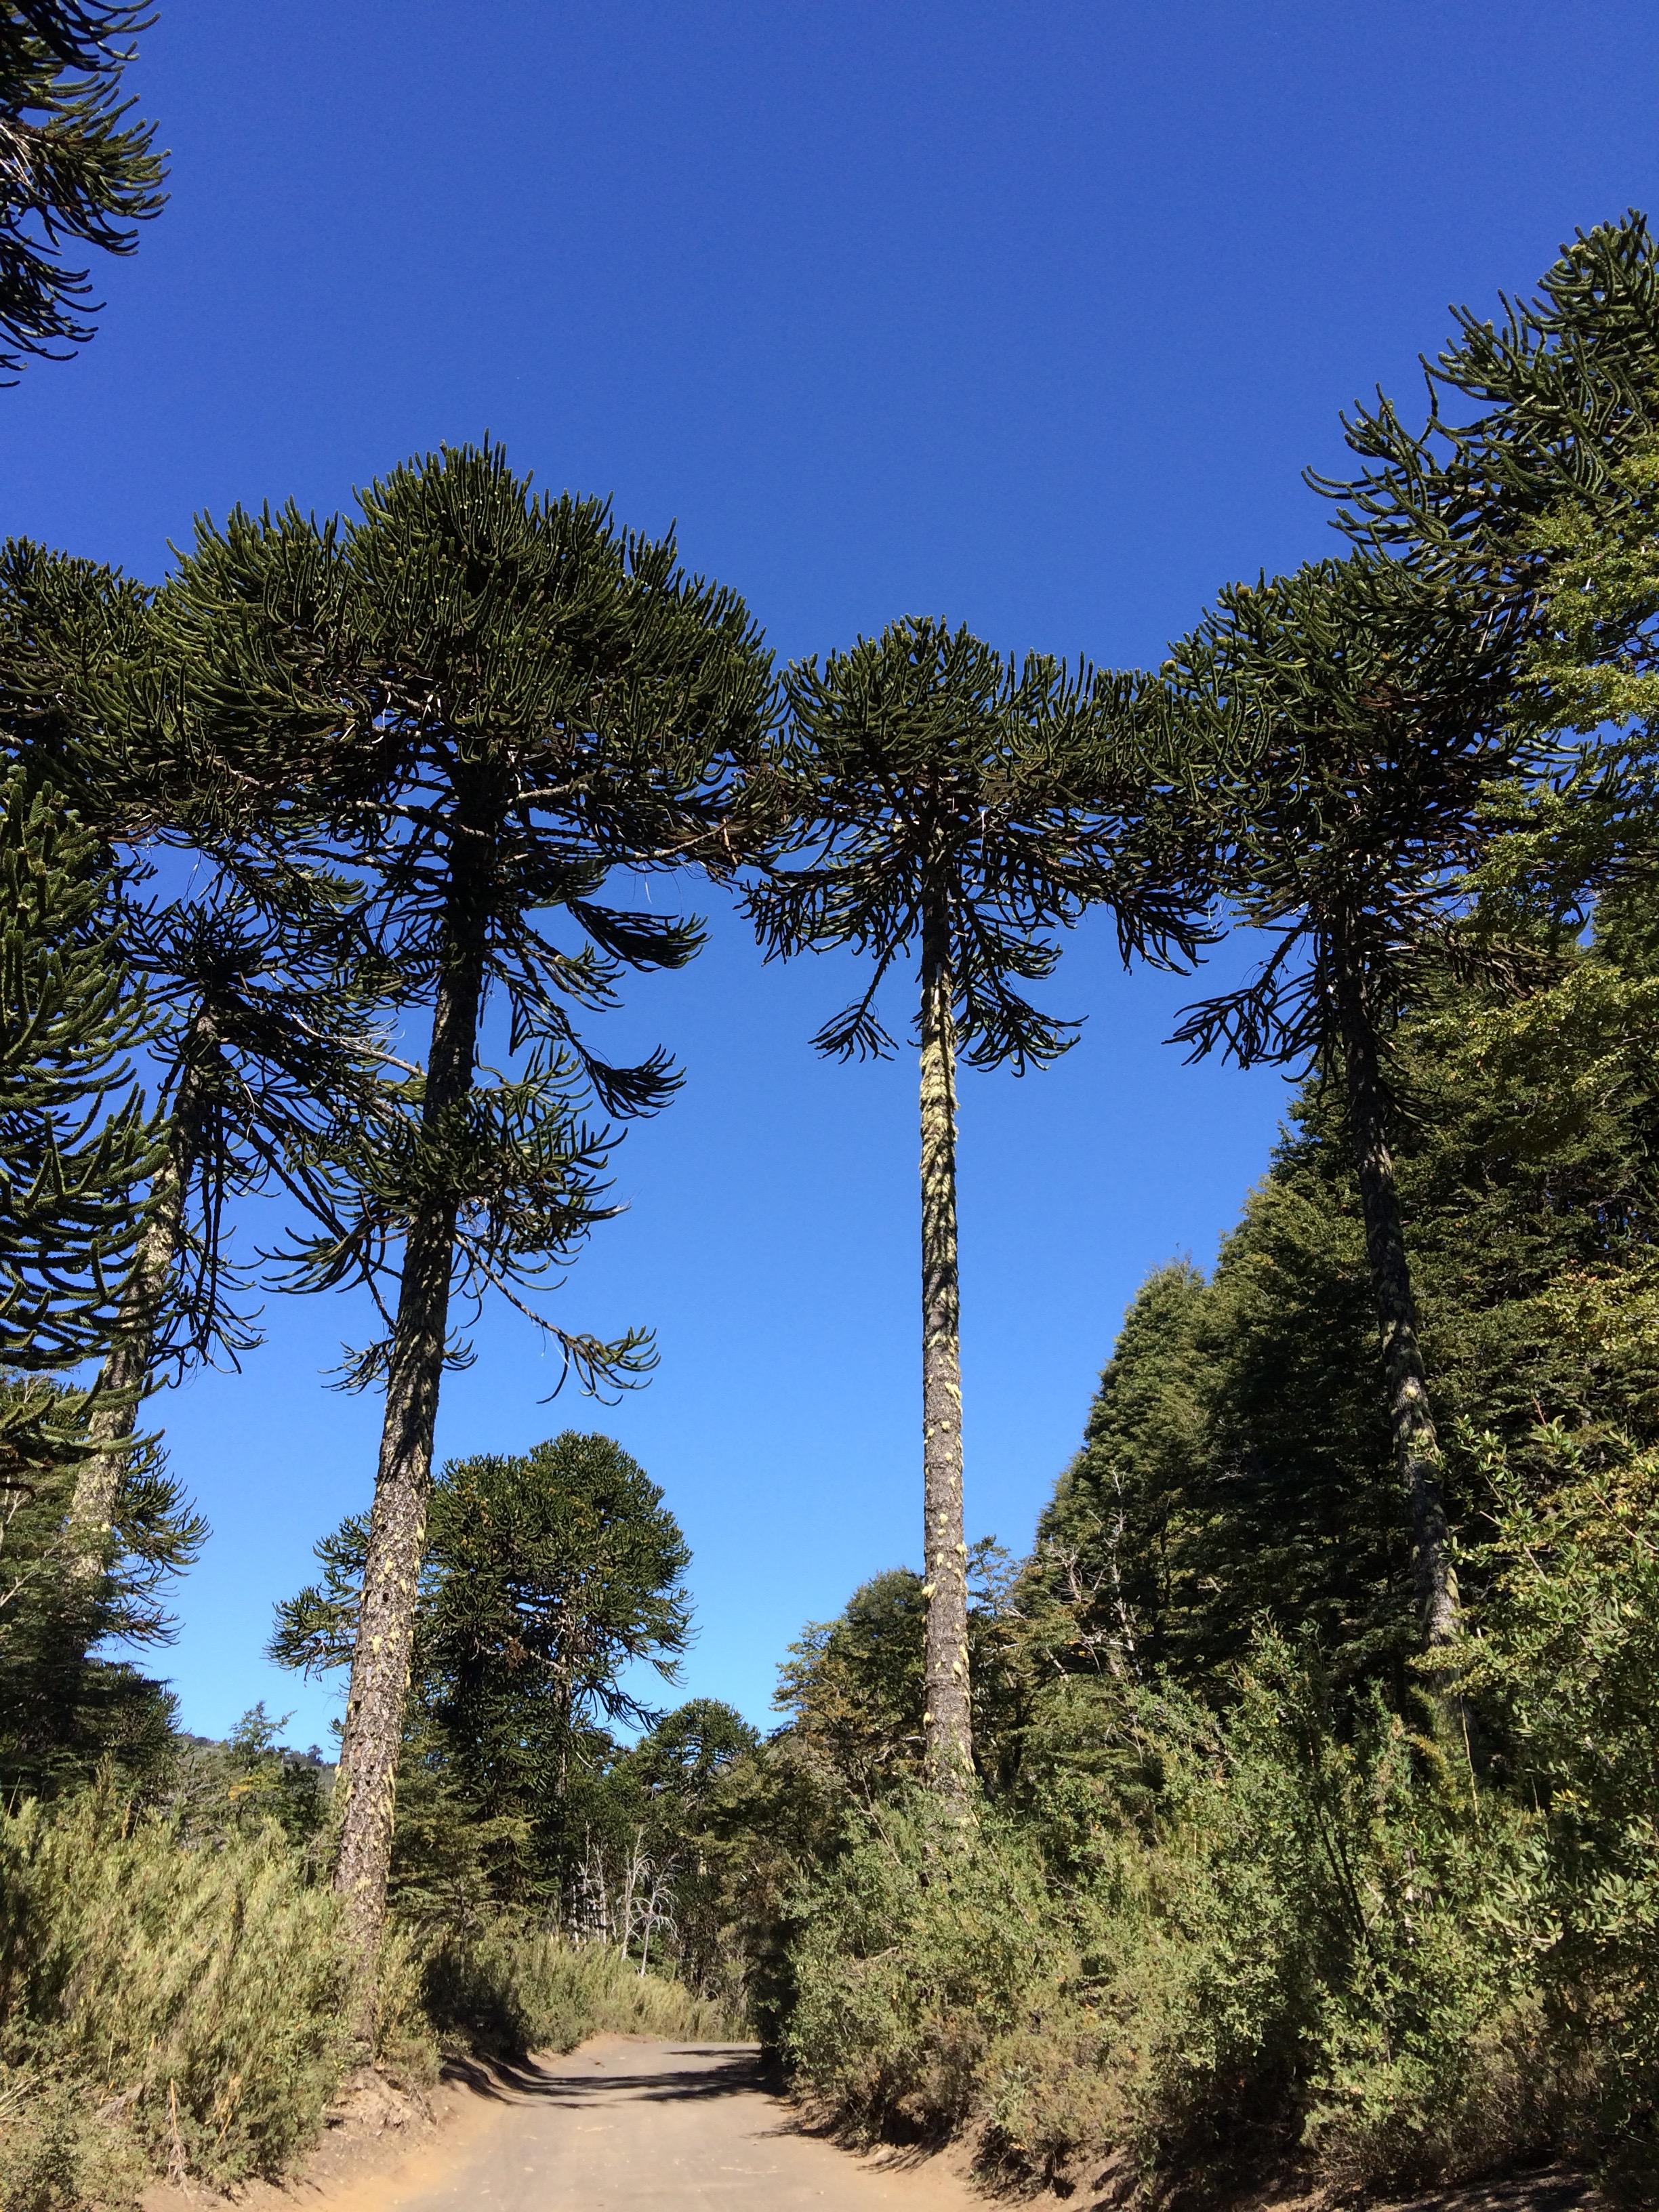 Monkey trees, Conguillio National Park, Chile